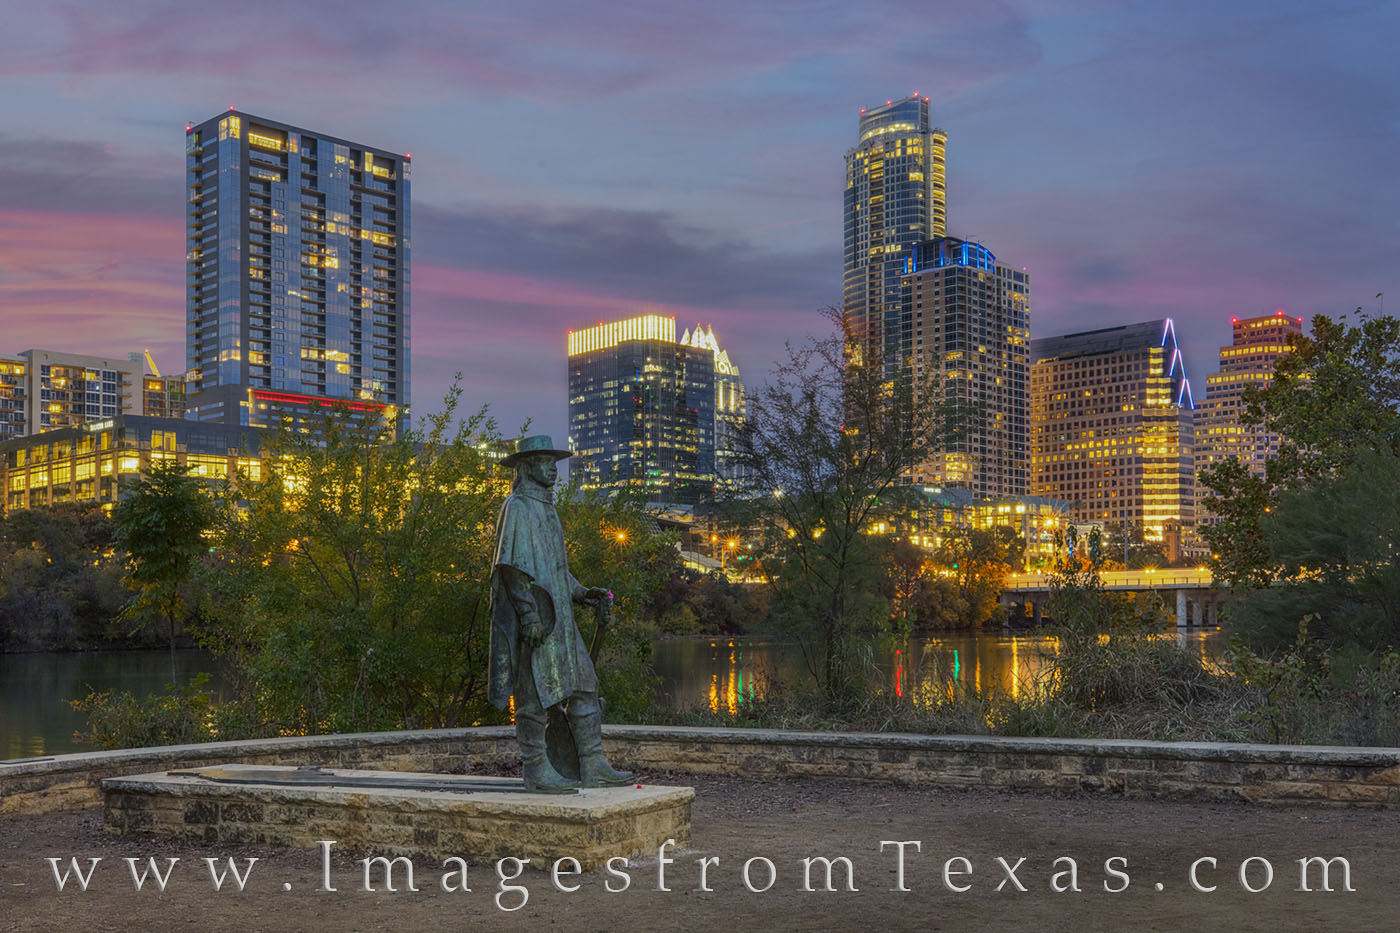 SRV statue, stevie ray vaughan, austin skyline, downtown austin, zilker park trail, zilker park, town lake, ladybird lake, austin icons, photo